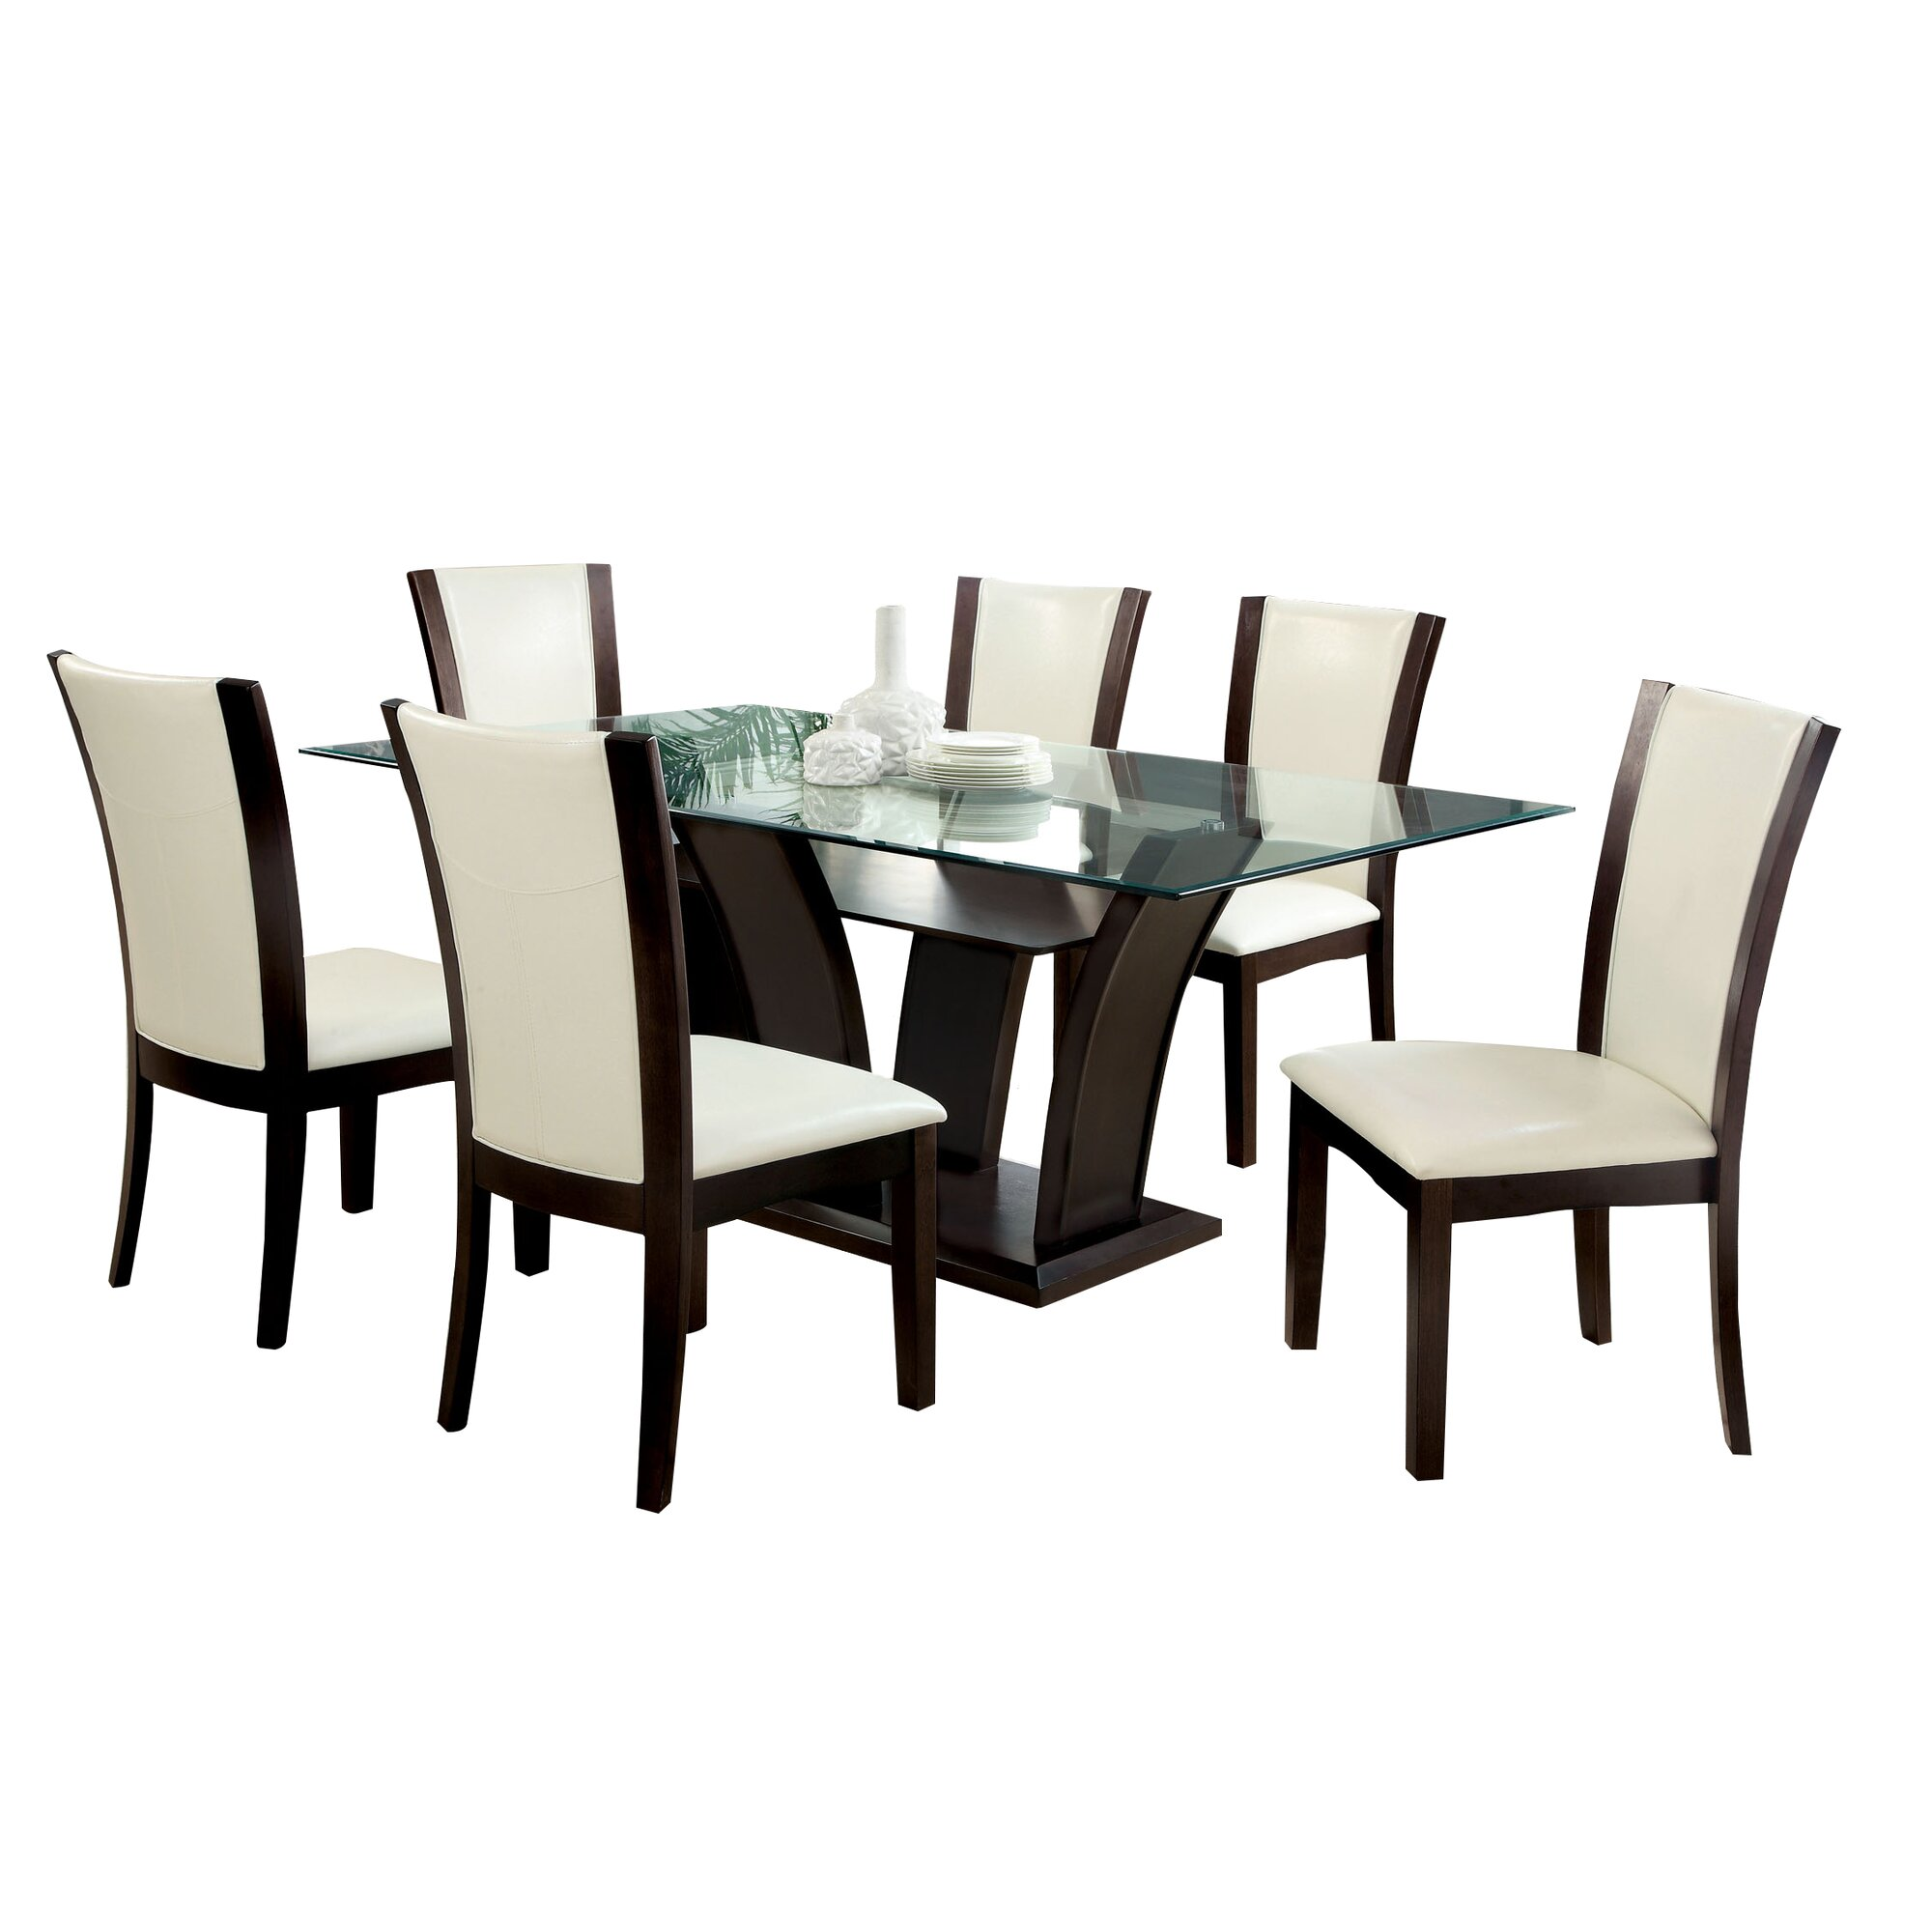 Hokku designs carmilla 7 piece dining set reviews wayfair for Hokku designs dining room furniture